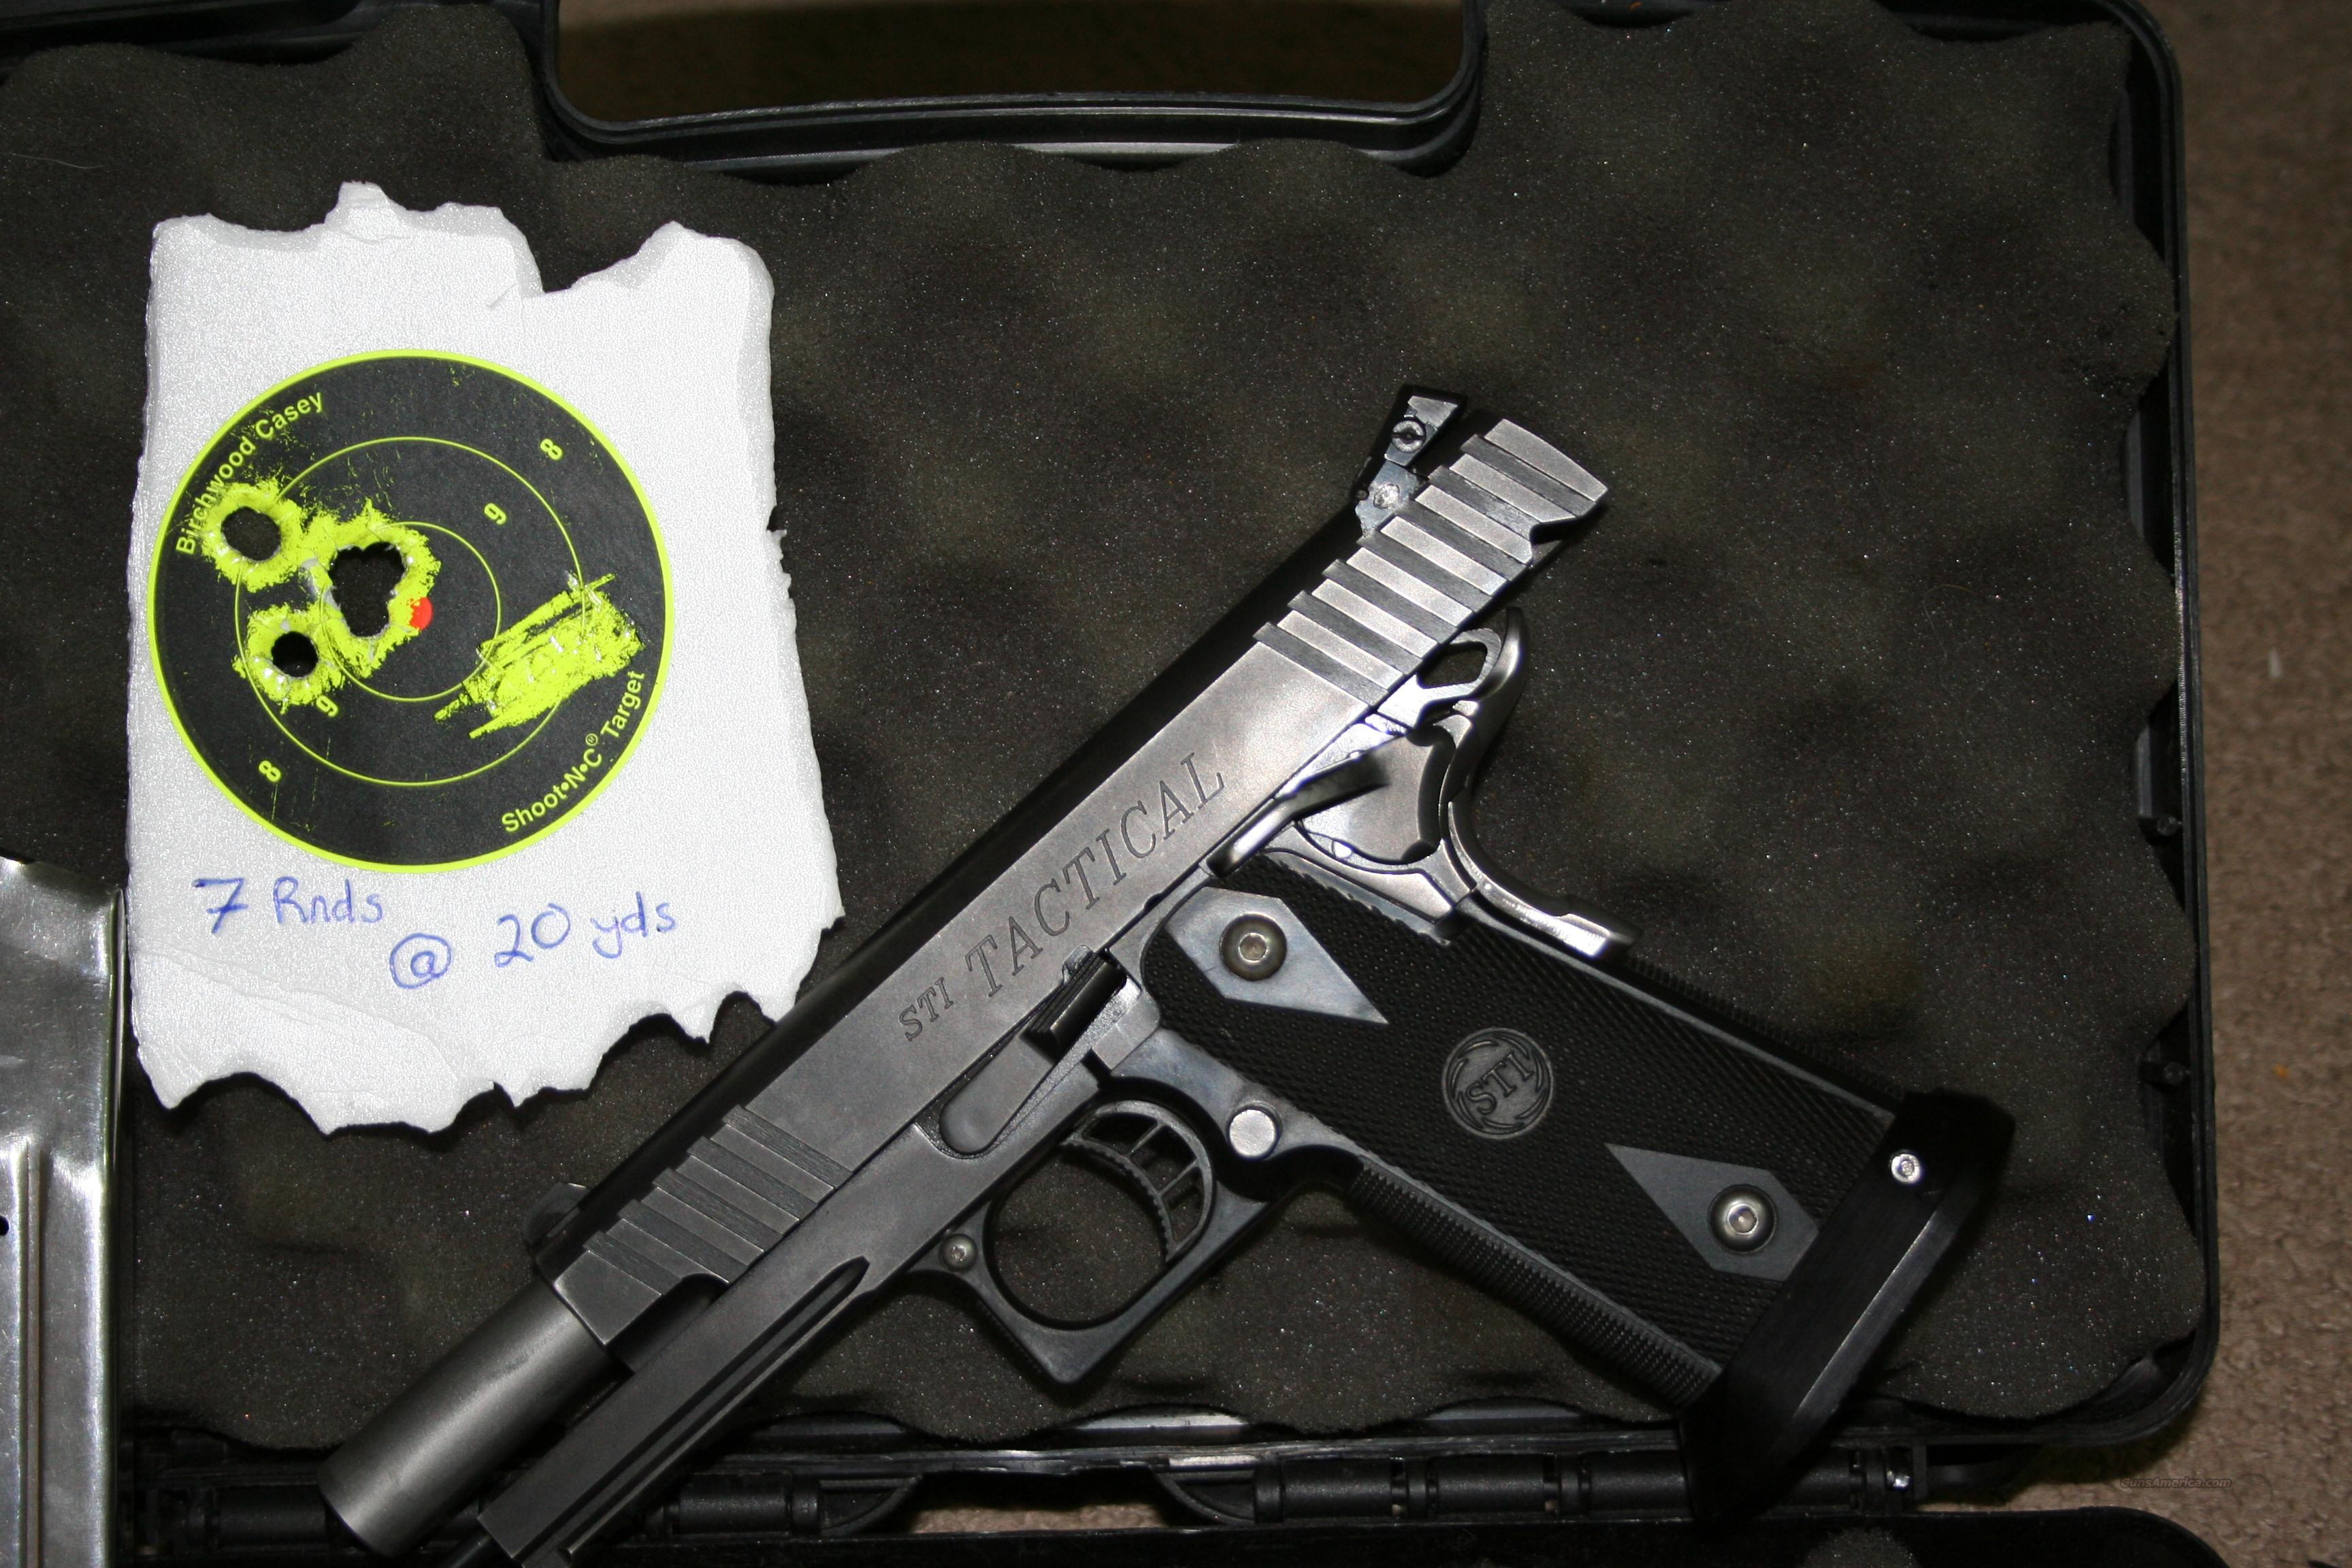 STI Tactical 5.0 .45 ACP  Guns > Pistols > STI Pistols